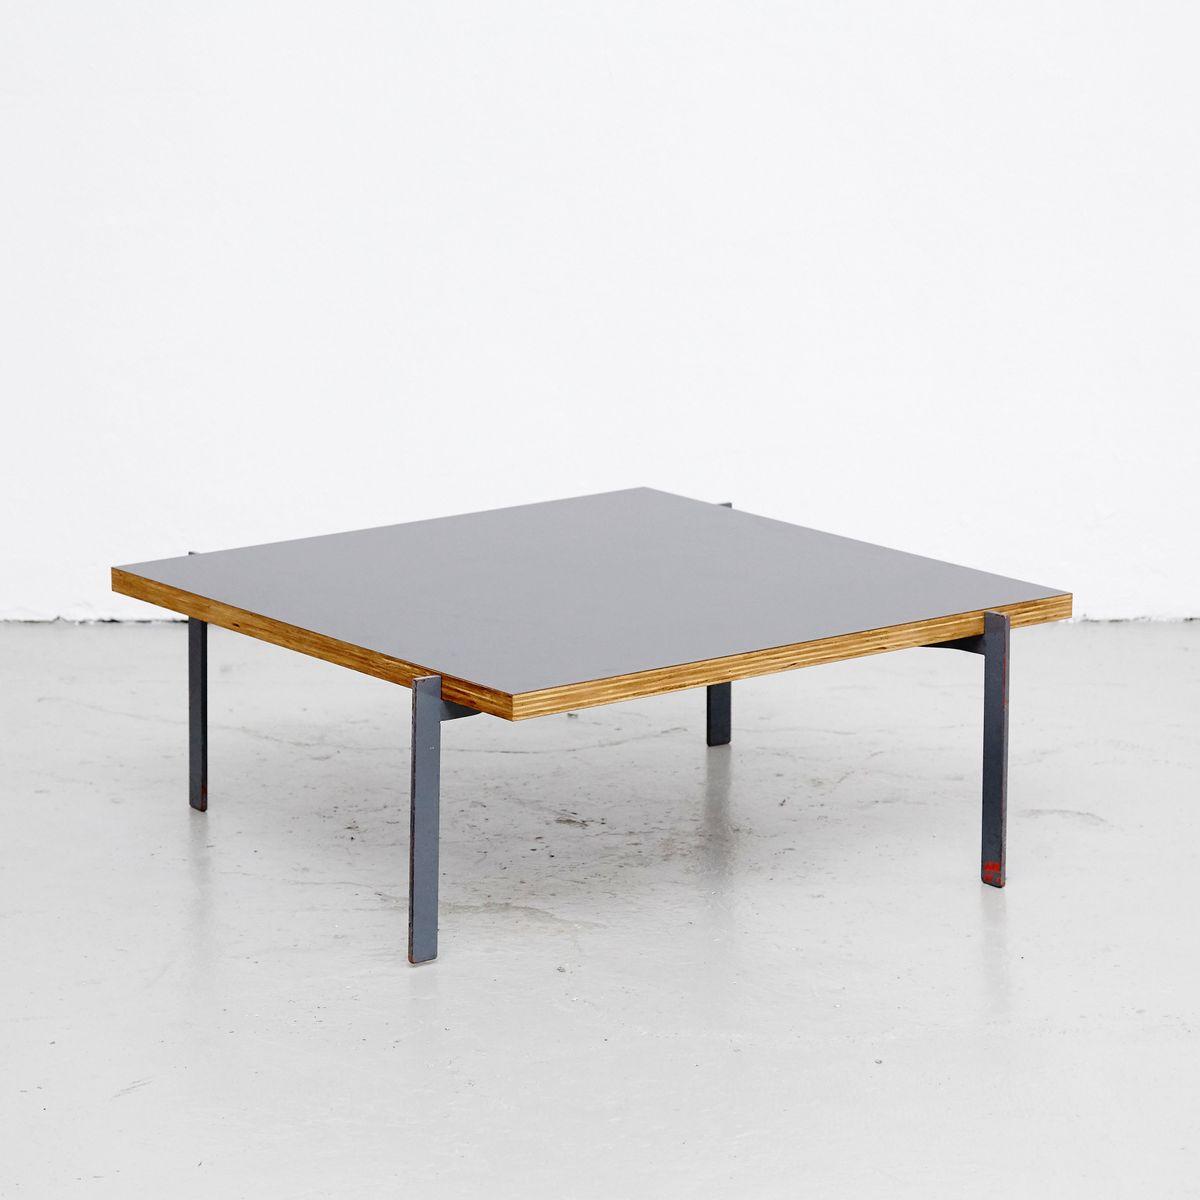 table basse en acier et bois danemark en vente sur pamono. Black Bedroom Furniture Sets. Home Design Ideas